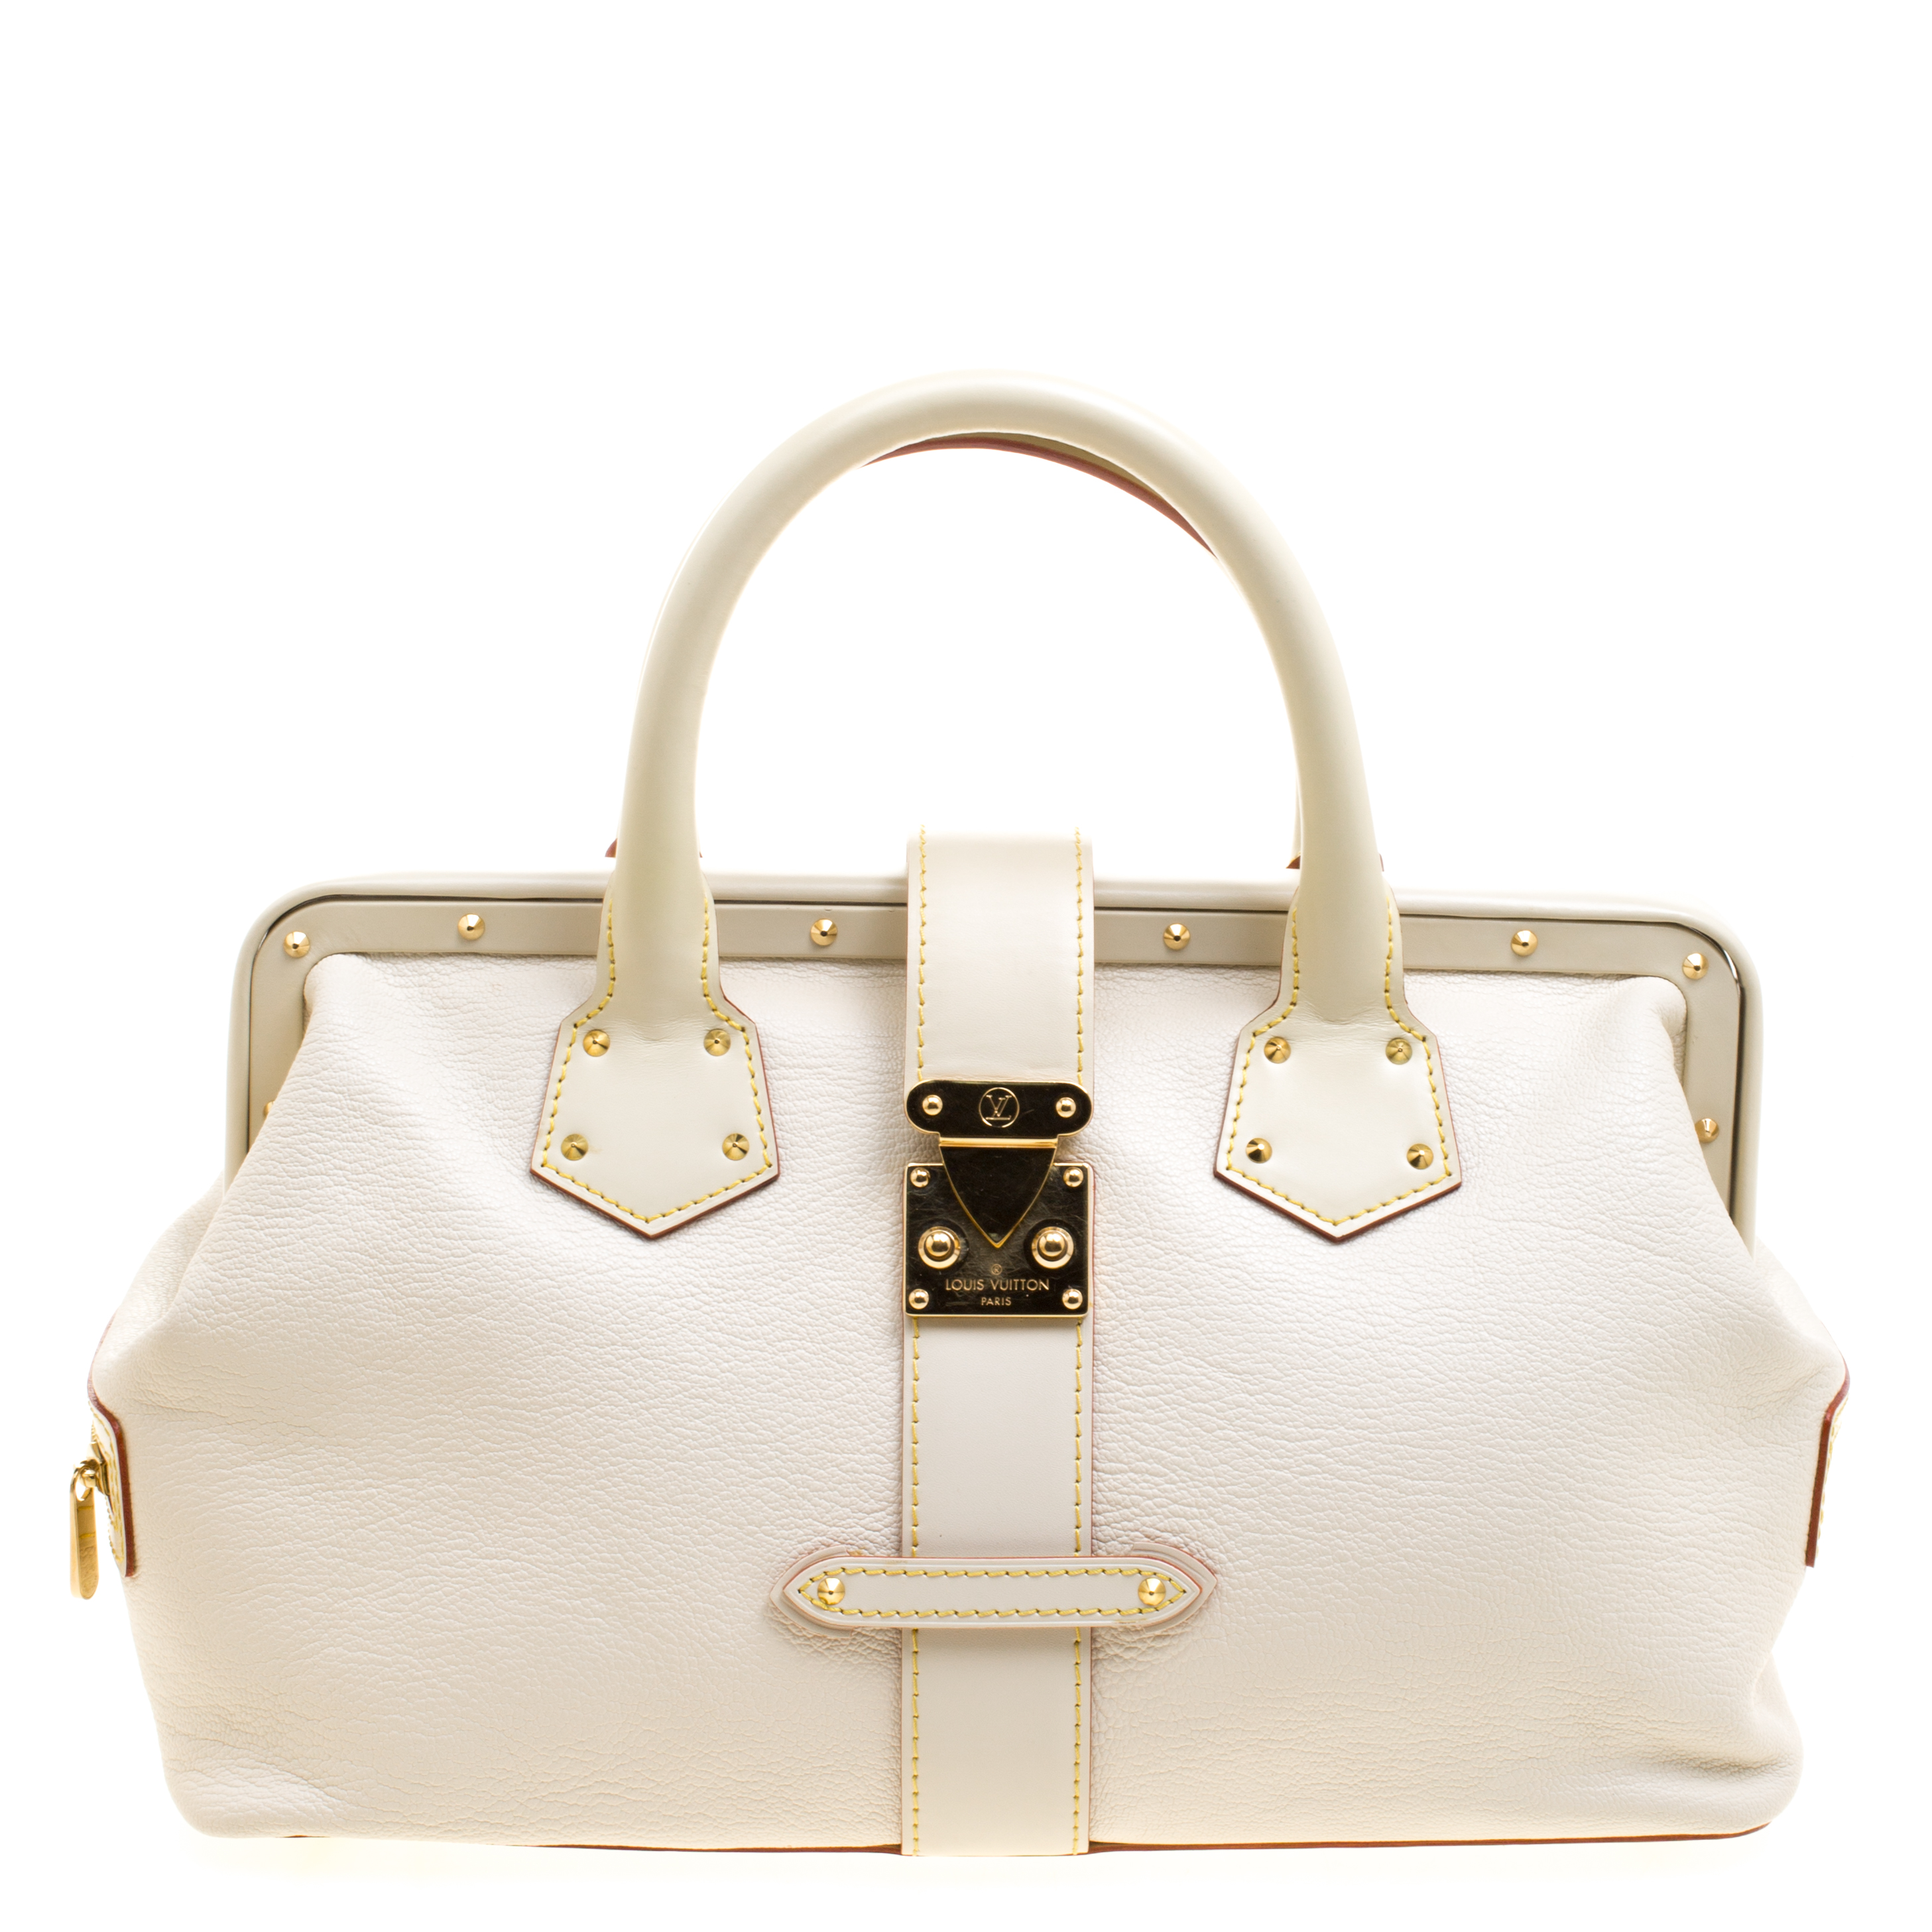 a9107ea687 Louis Vuitton White Suhali Leather L'Ingenieux PM Bag